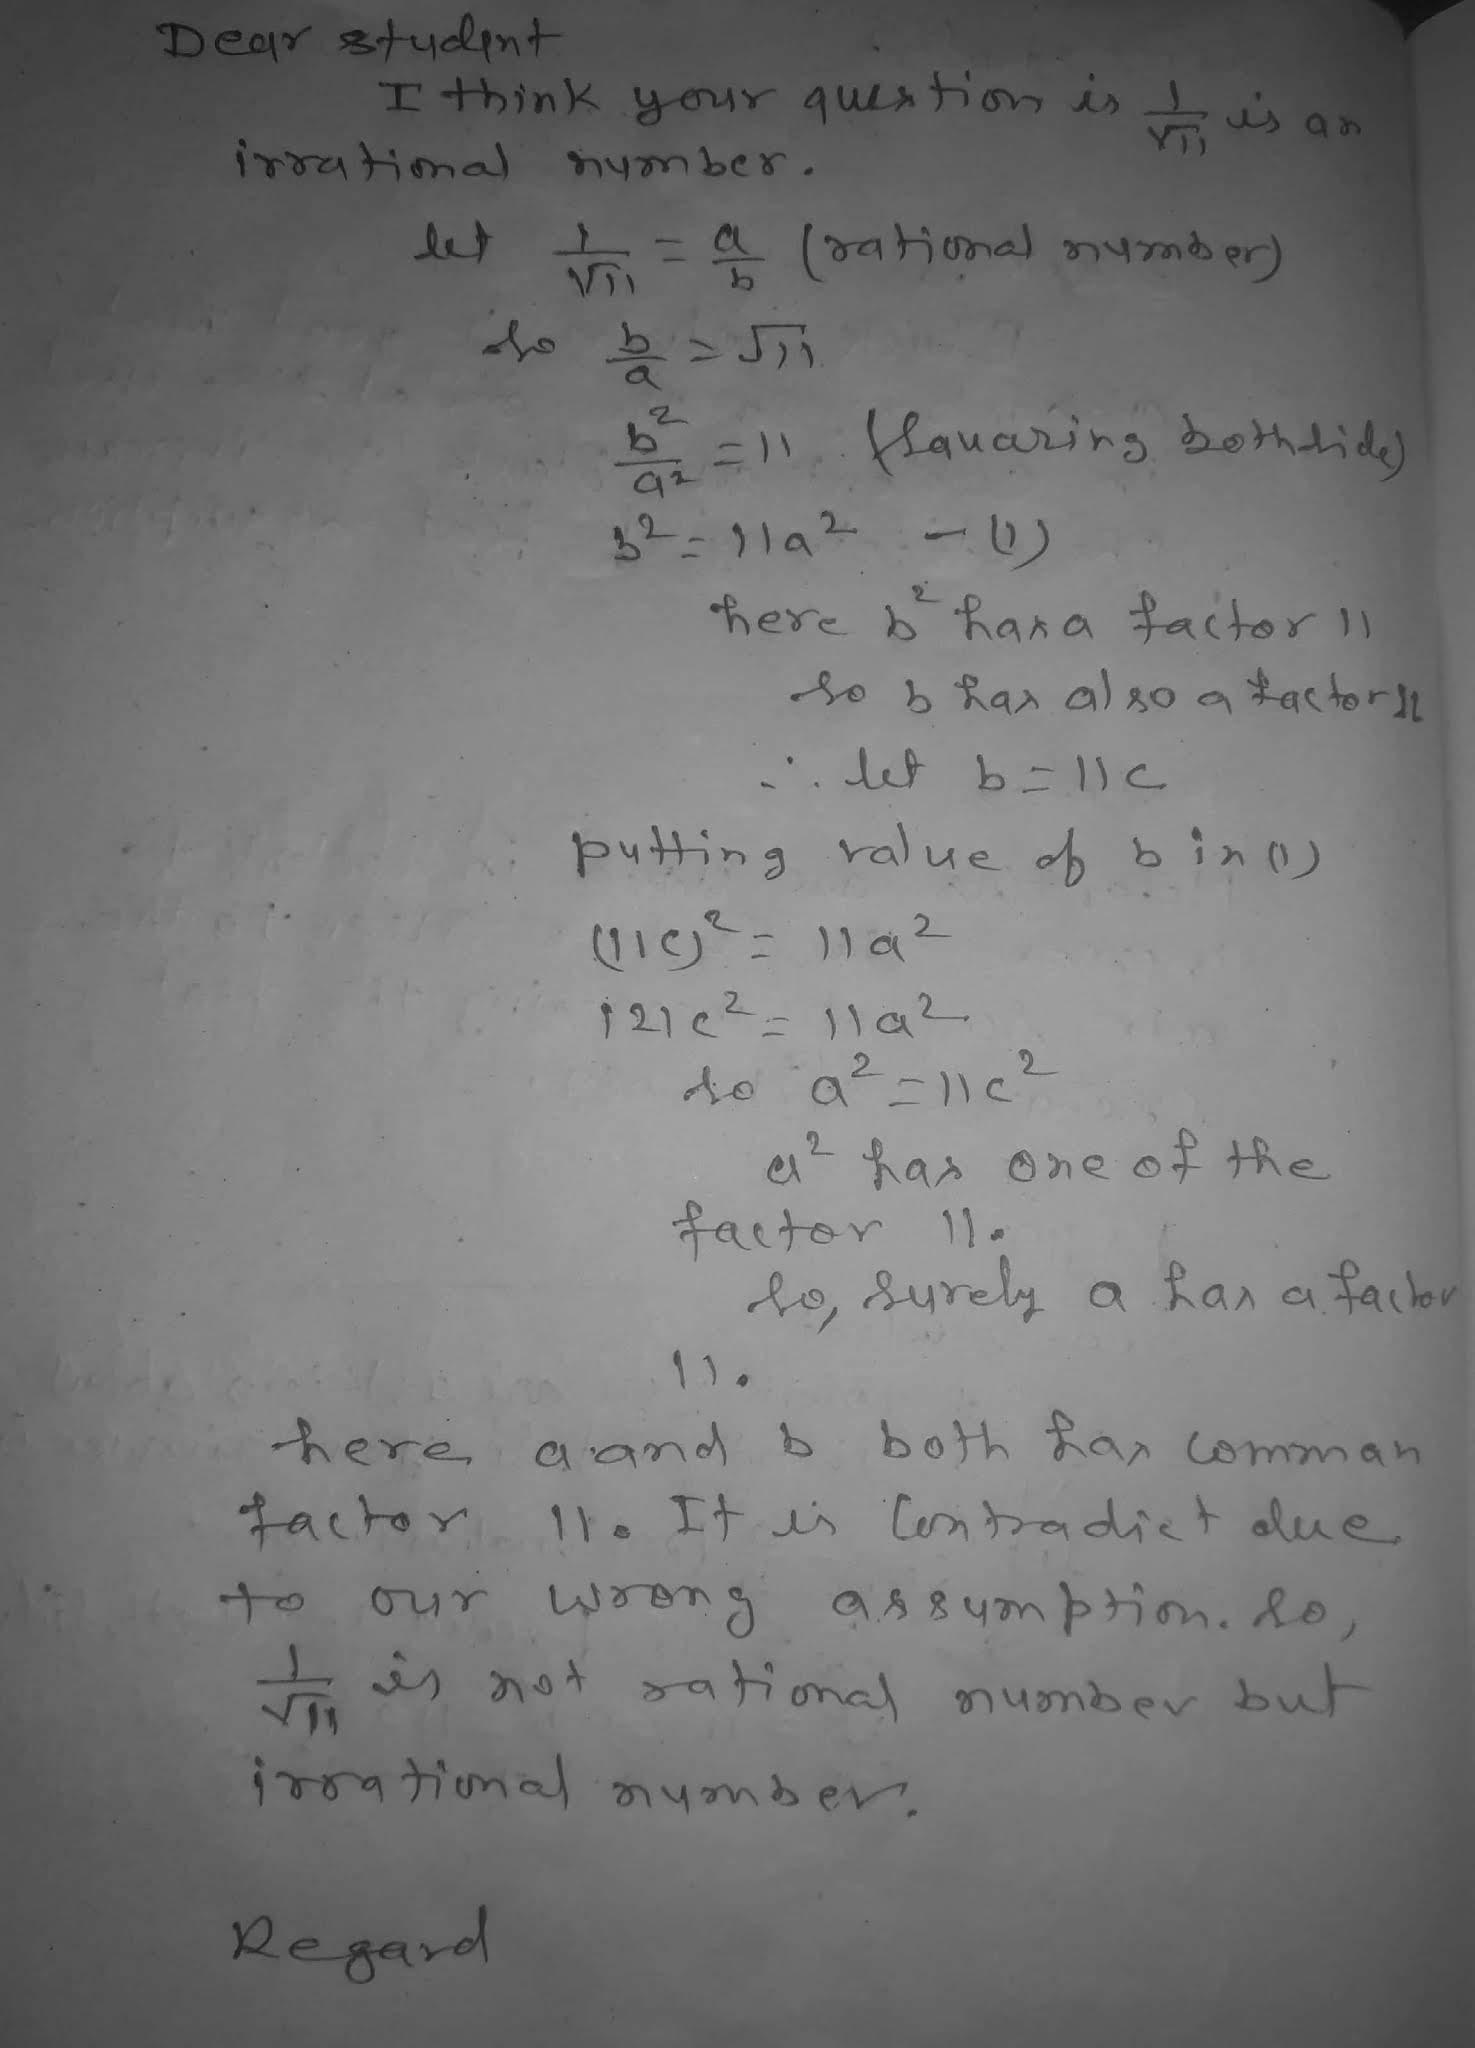 Caltech Computing + Mathematical Sciences